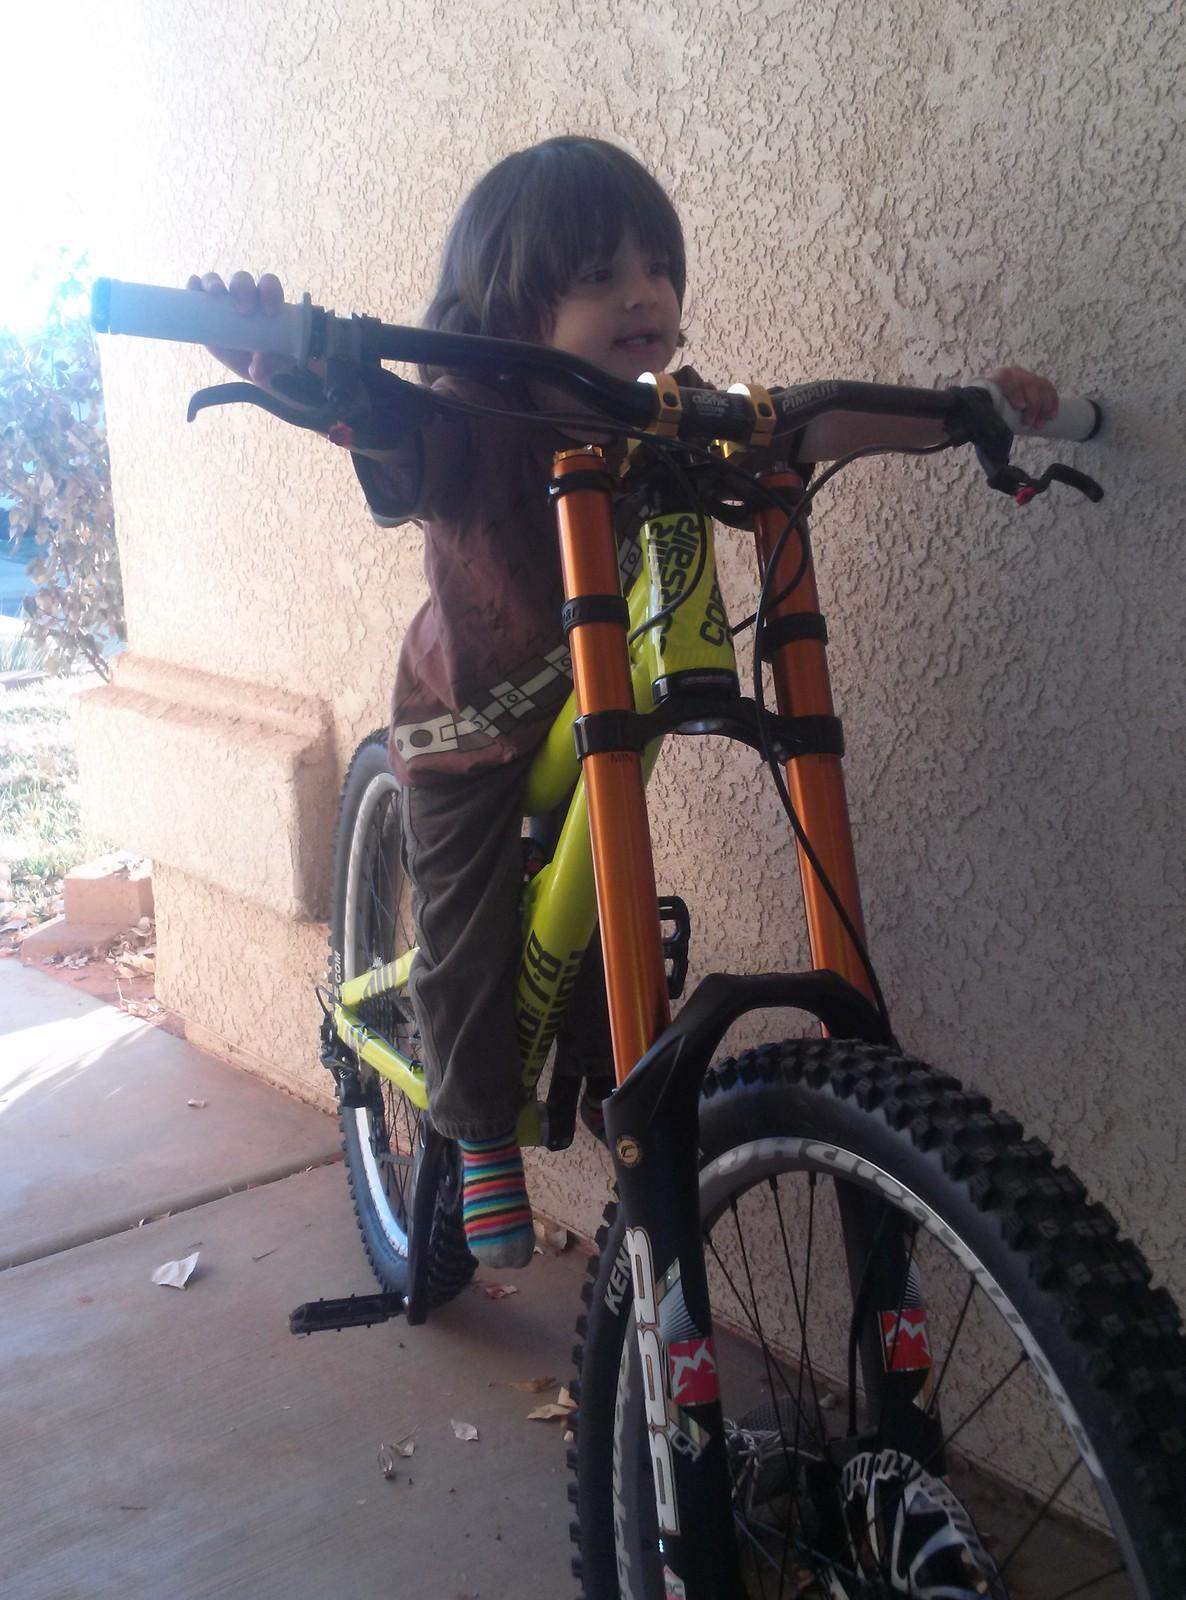 Konig 7·8 in the USA - Corsair Bikes - Mountain Biking Pictures - Vital MTB